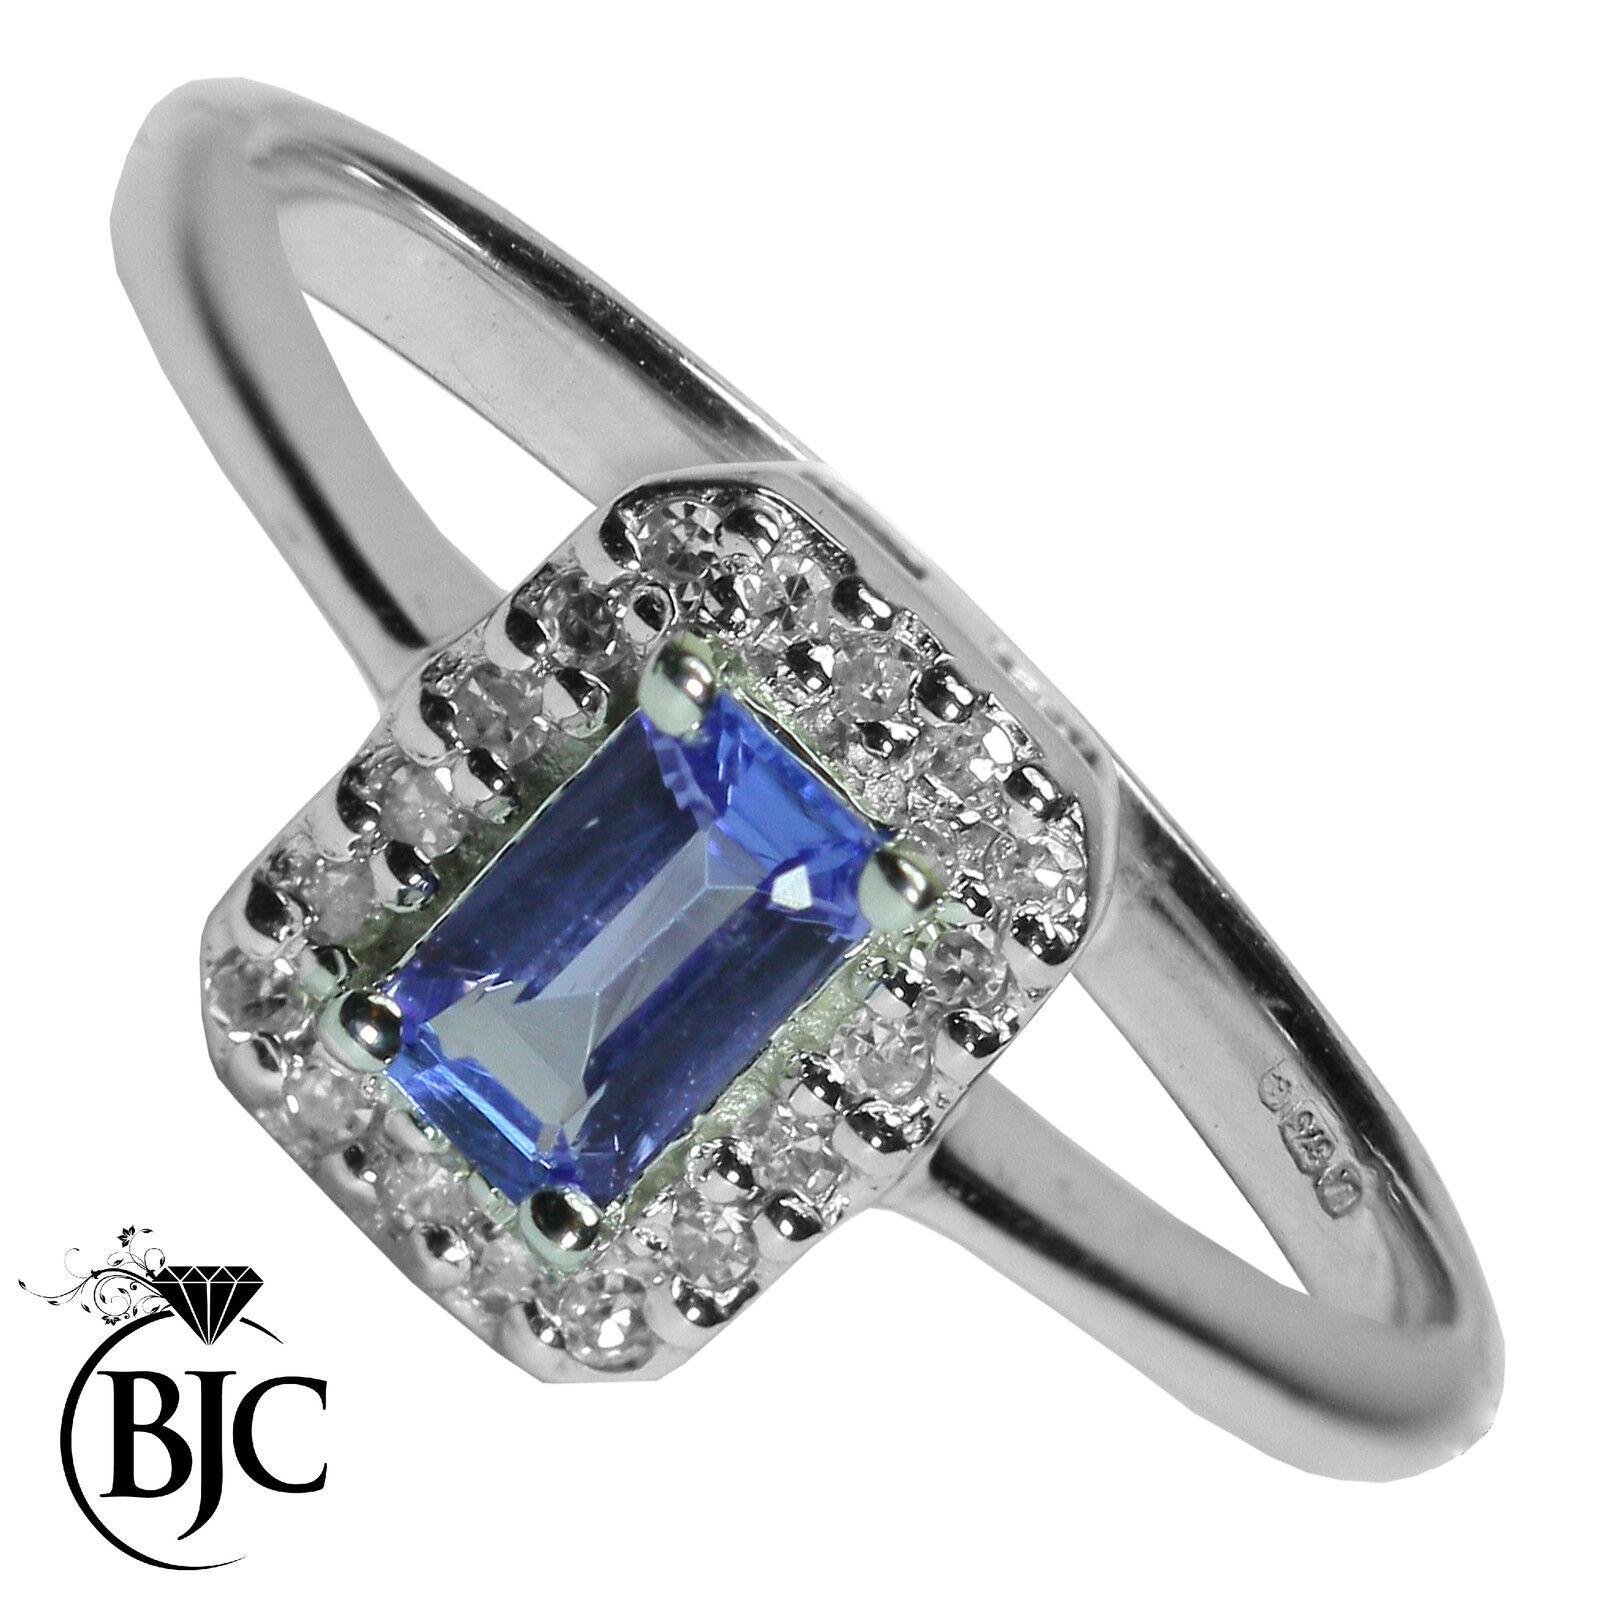 Bjc 9 Karat Weiss gold Tansanit & Diamant Klaster SIZE L Verlobungsring R25